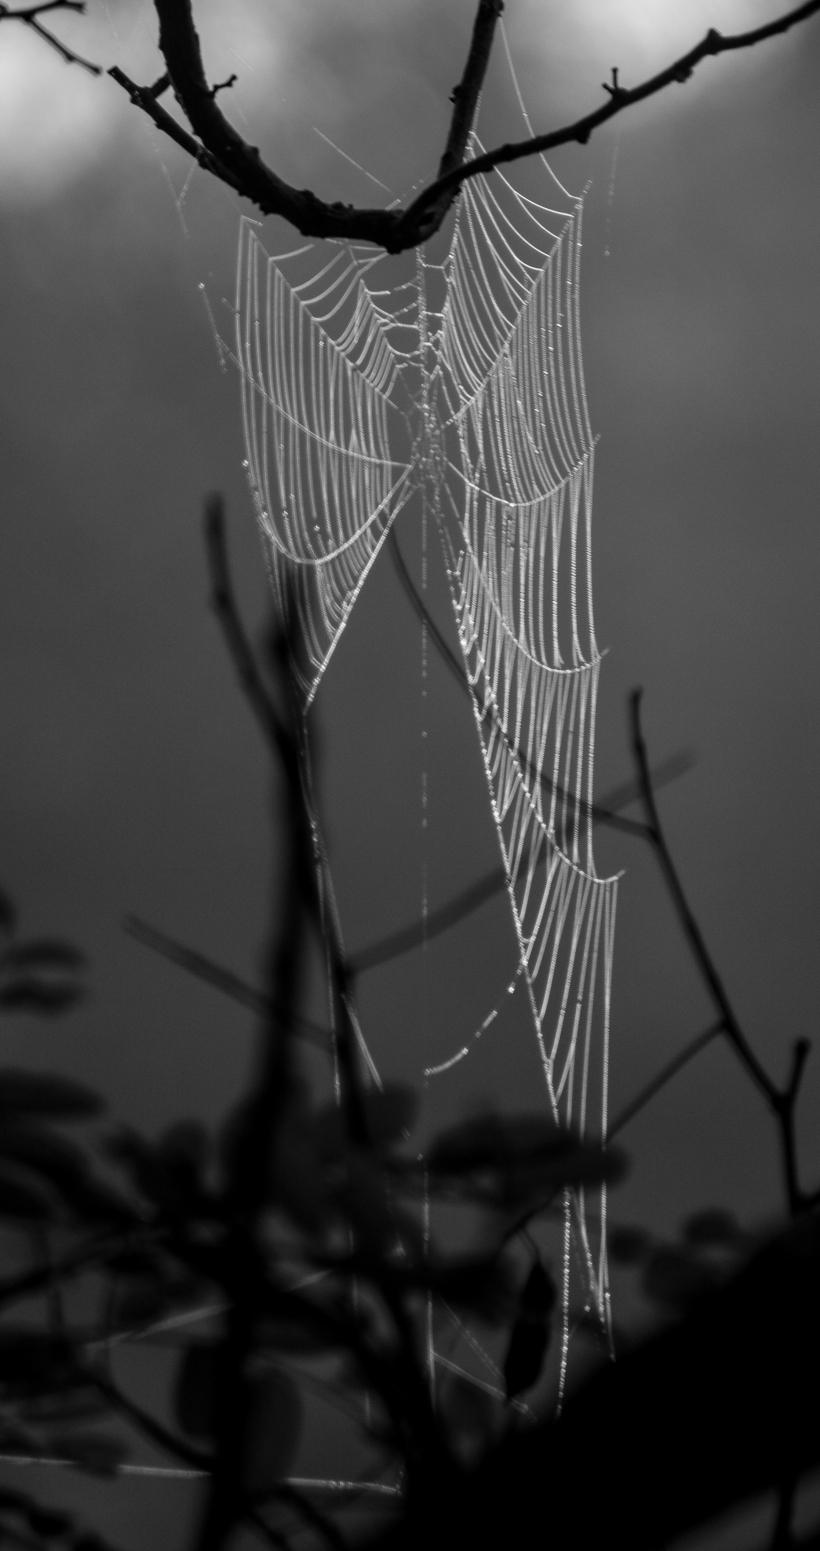 draped-web-0414